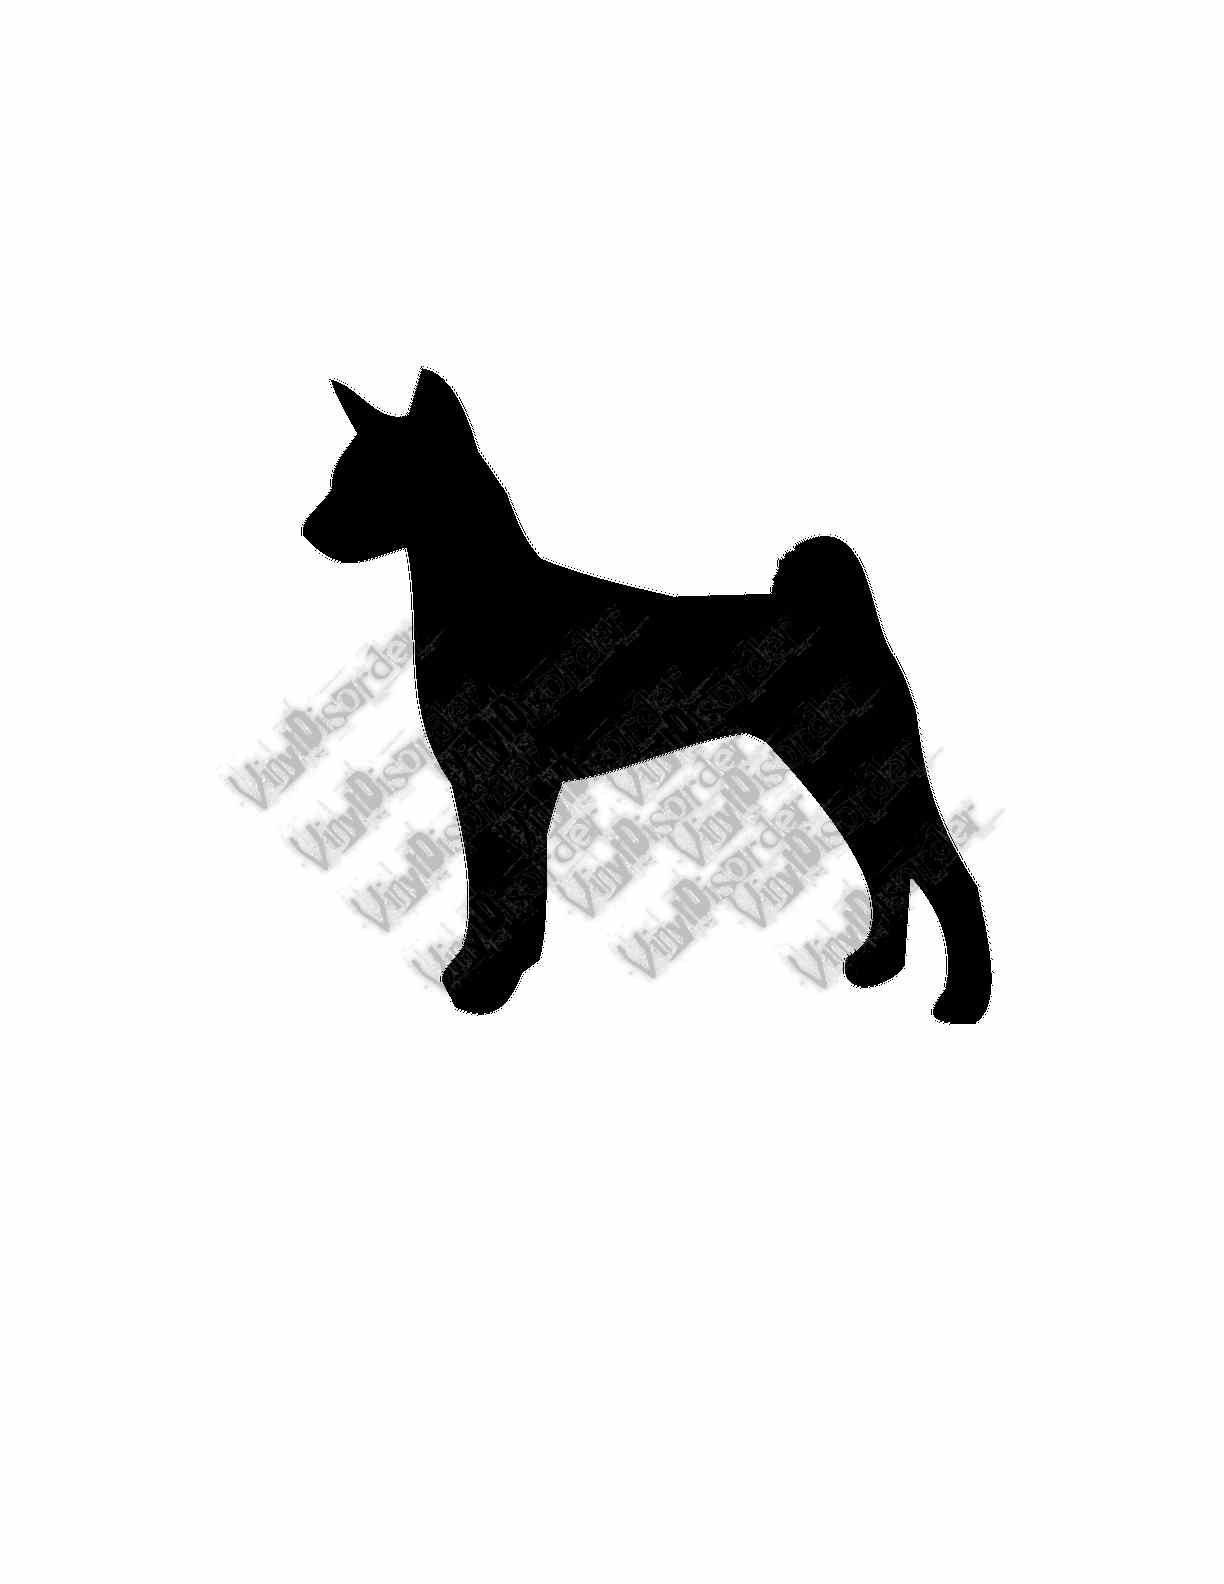 Obedience High Jump Dog Wall Decal Custom Vinyl Decal Vinyls - Custom vinyl wall decals dogs